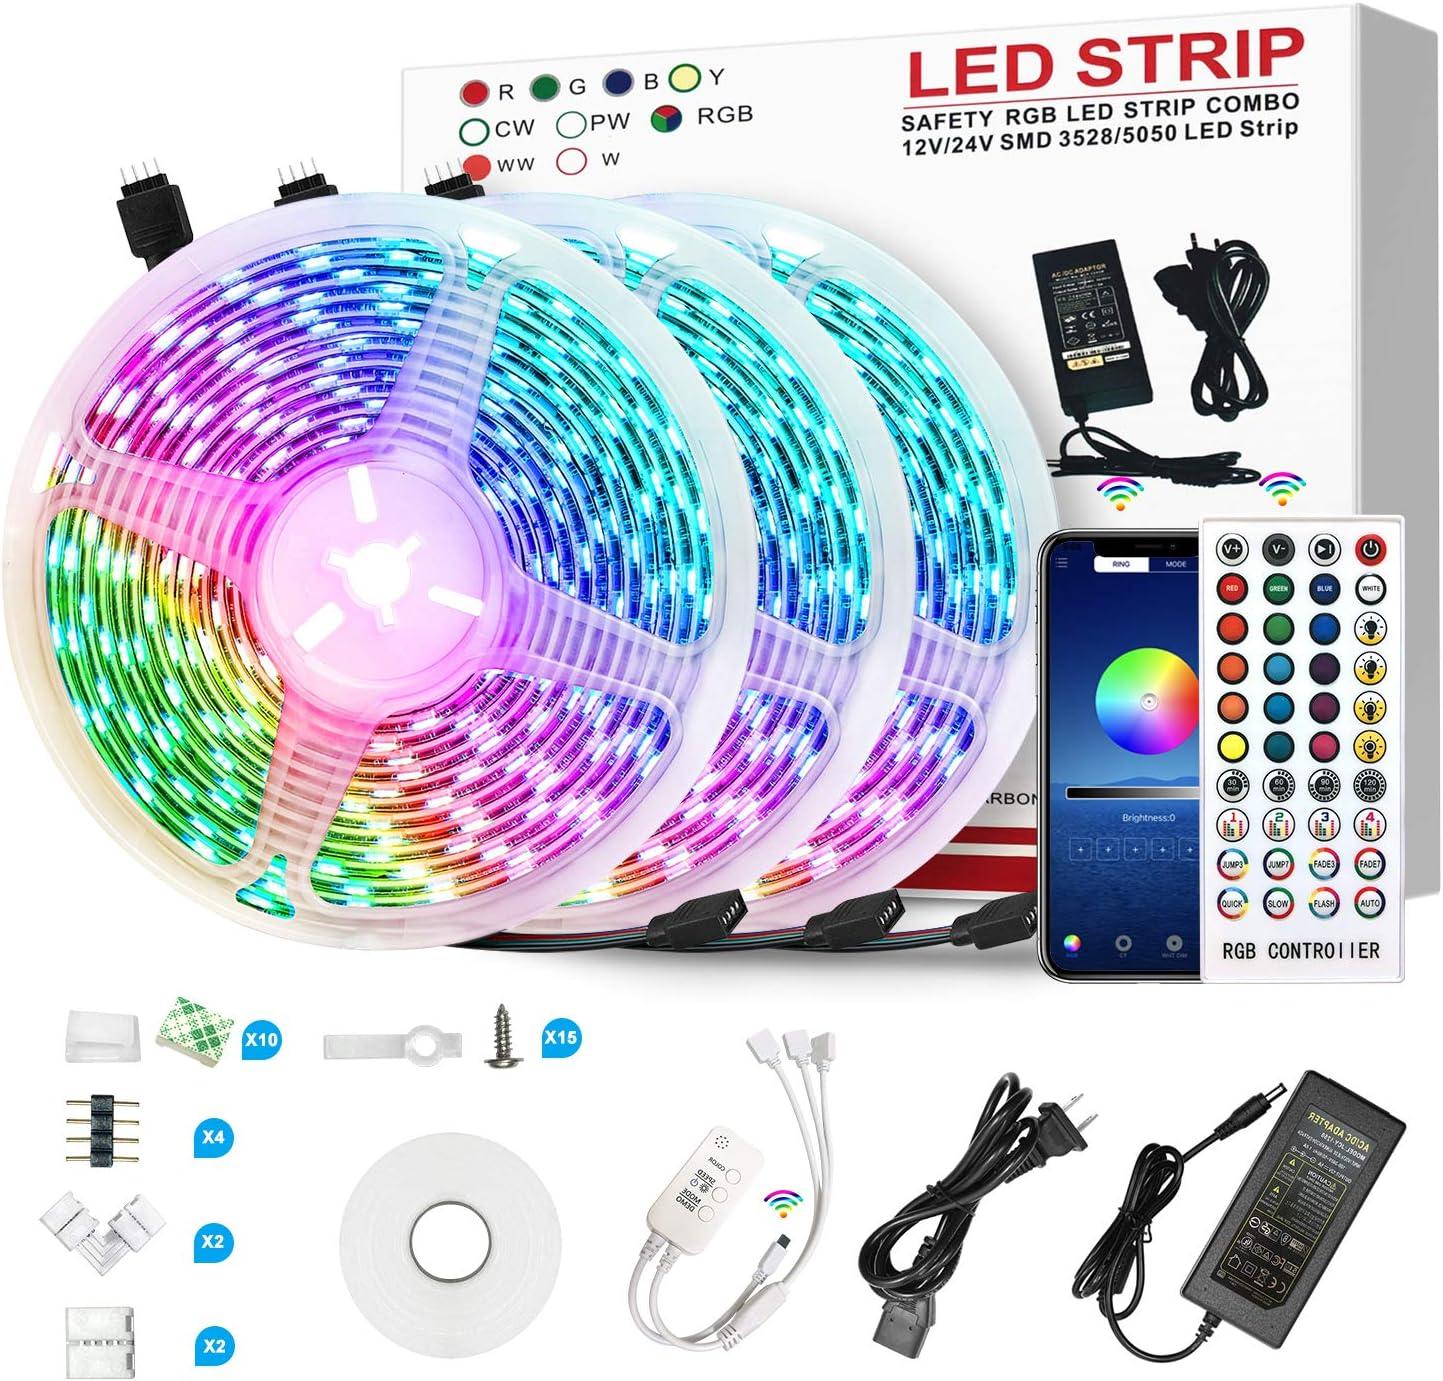 LED Strip Lights 10M 50FT RGB Color changing 44Key Remote Rooms Xmas Tape Lights